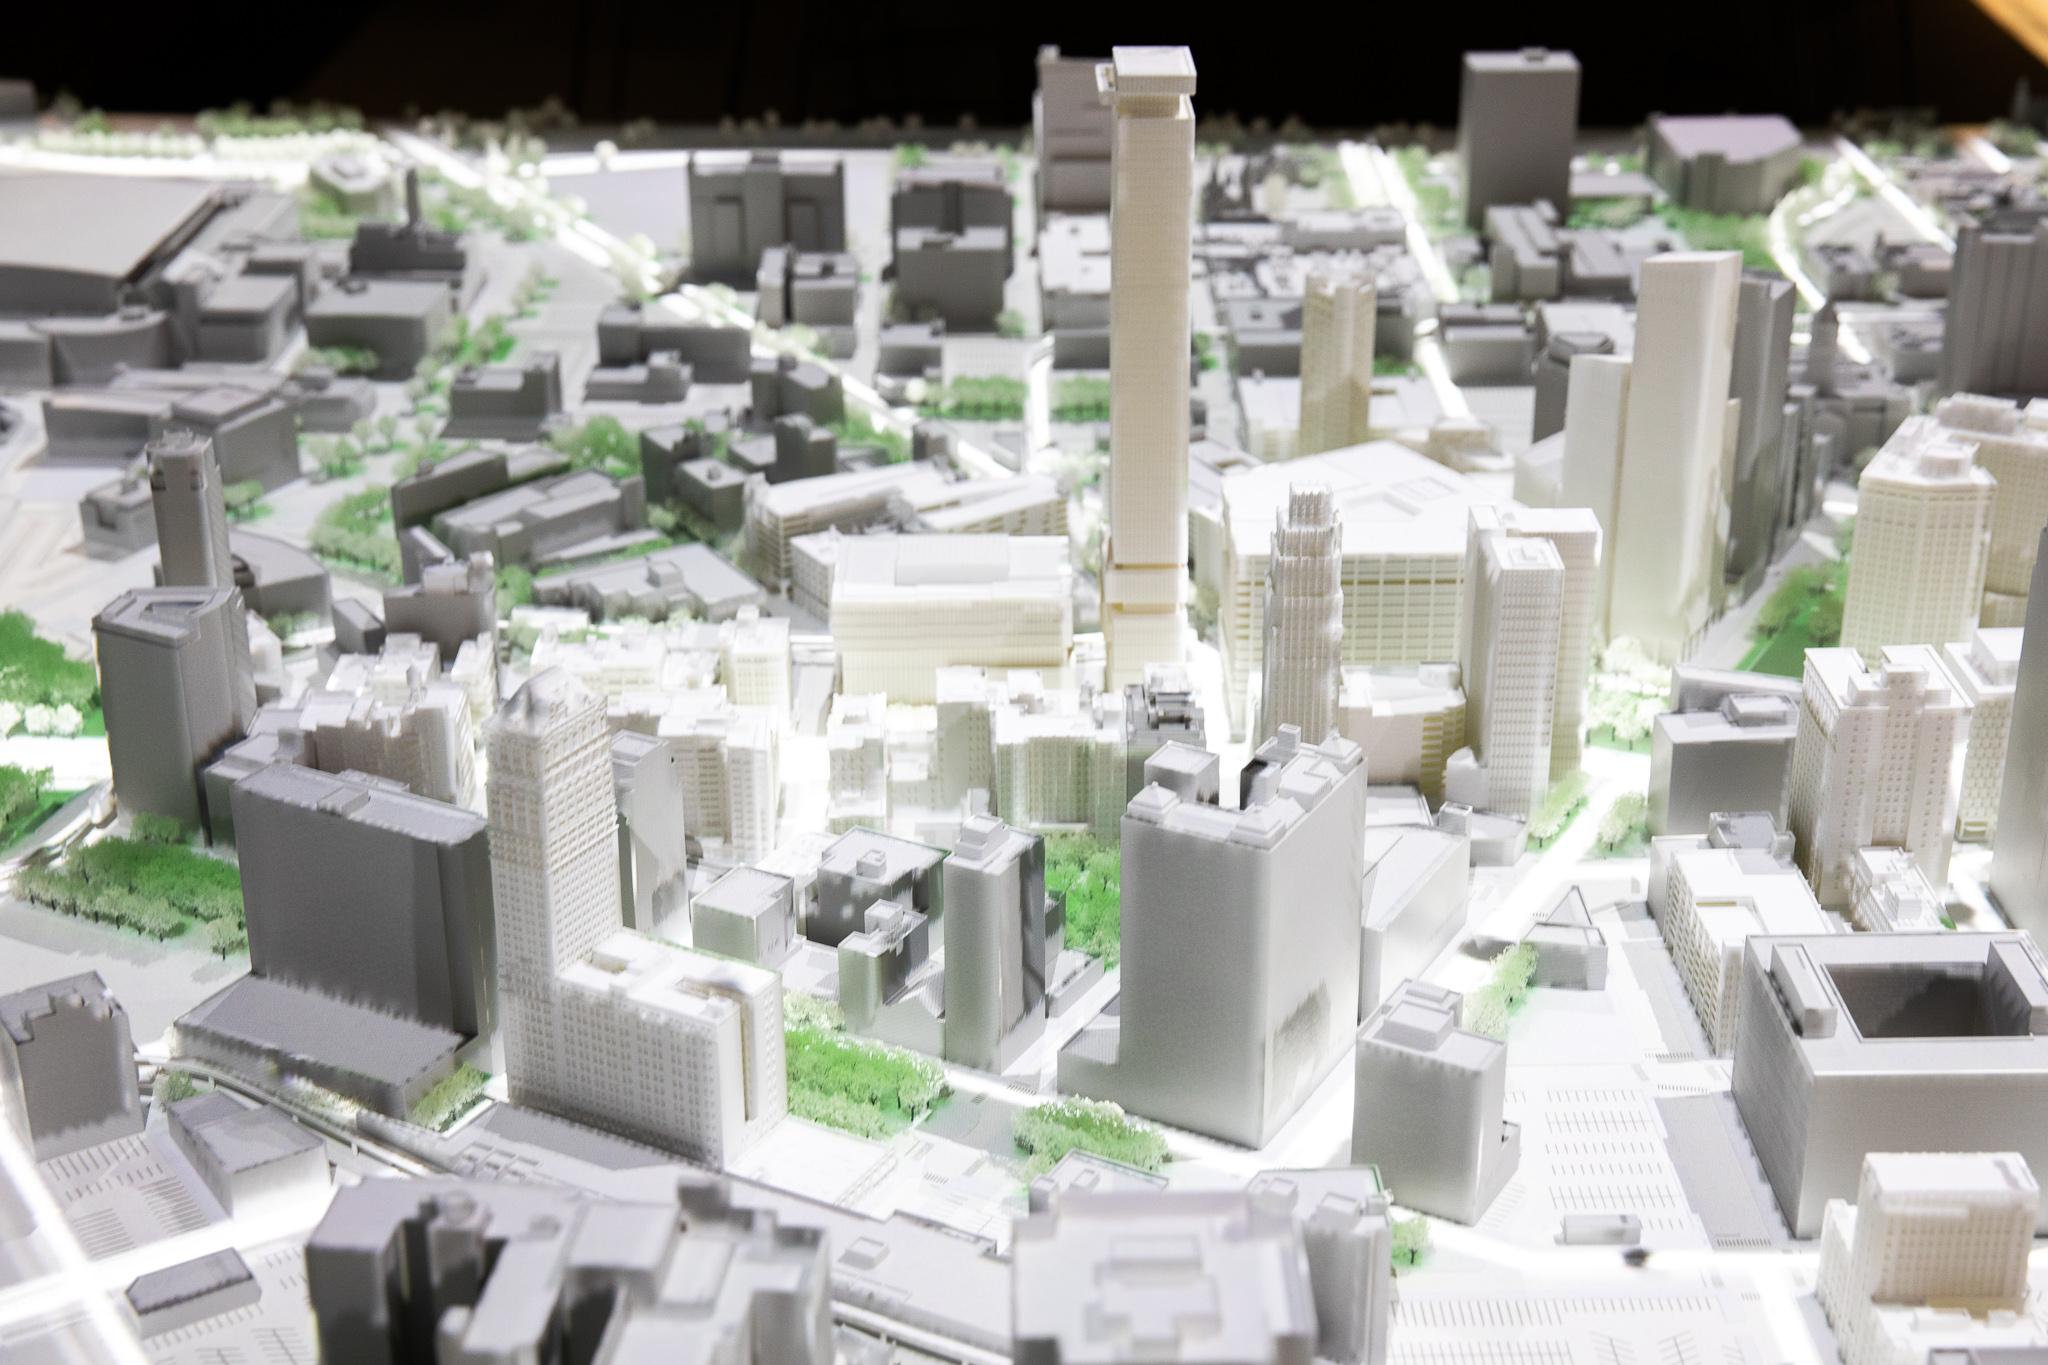 Bedrocku0027s 3D model shows Detroitu0027s skyline of